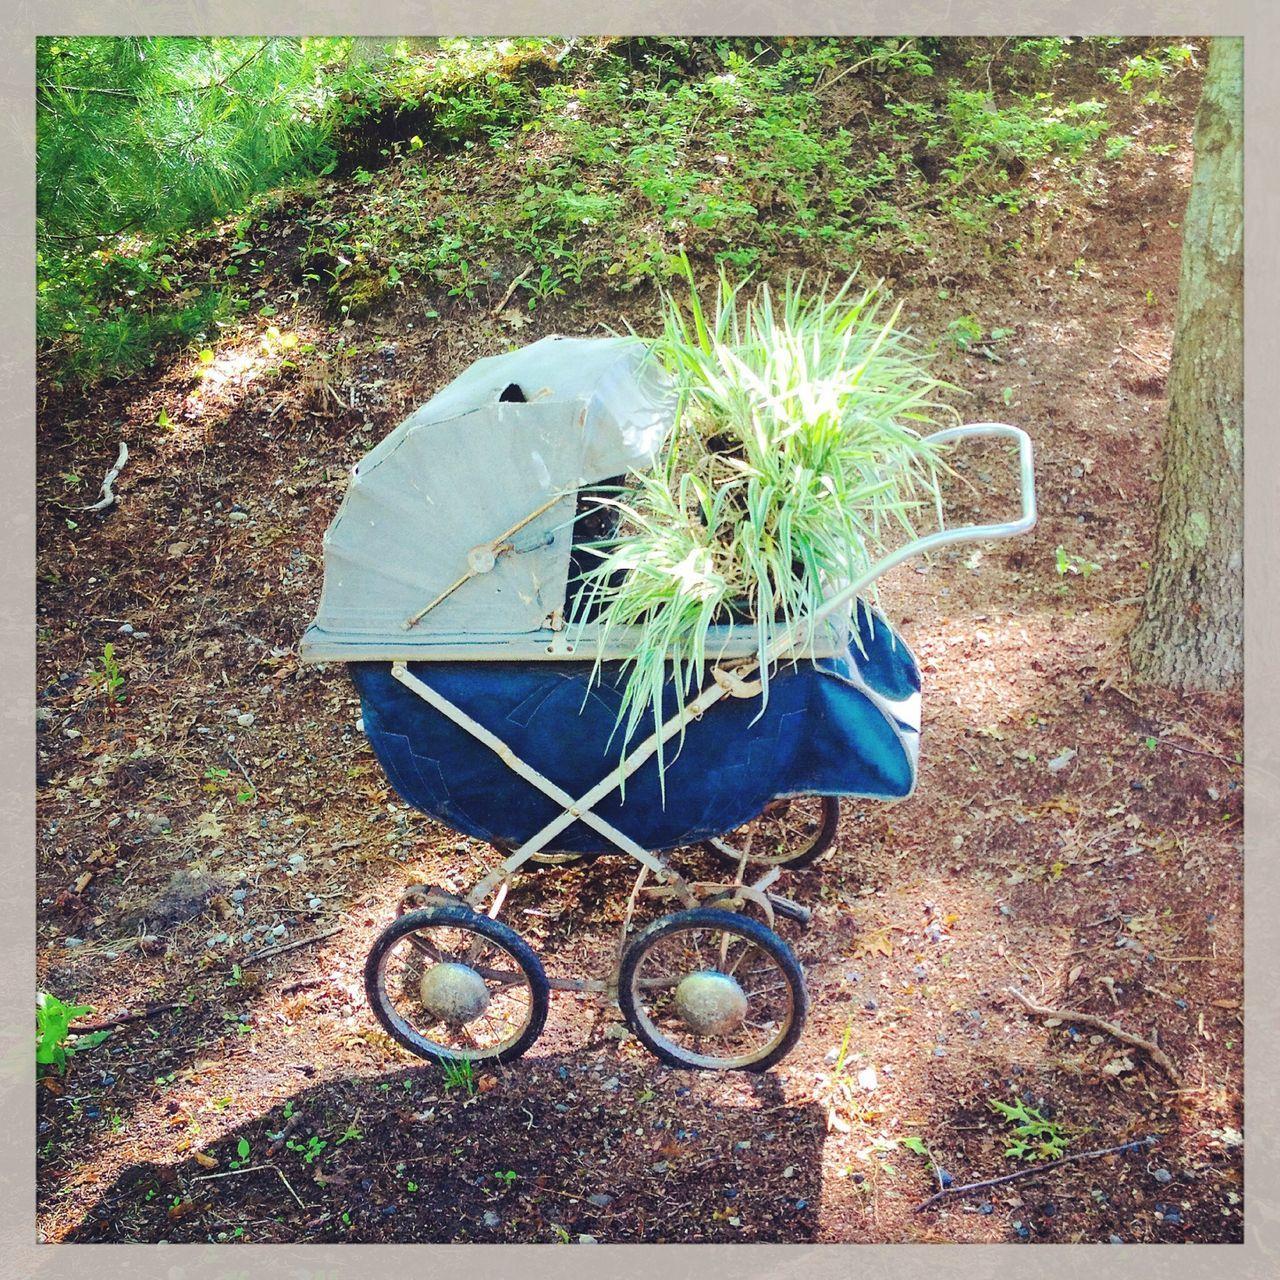 EyeEm Best Shots The Illusionist - 2014 EyeEm Awards Recycle Gardening